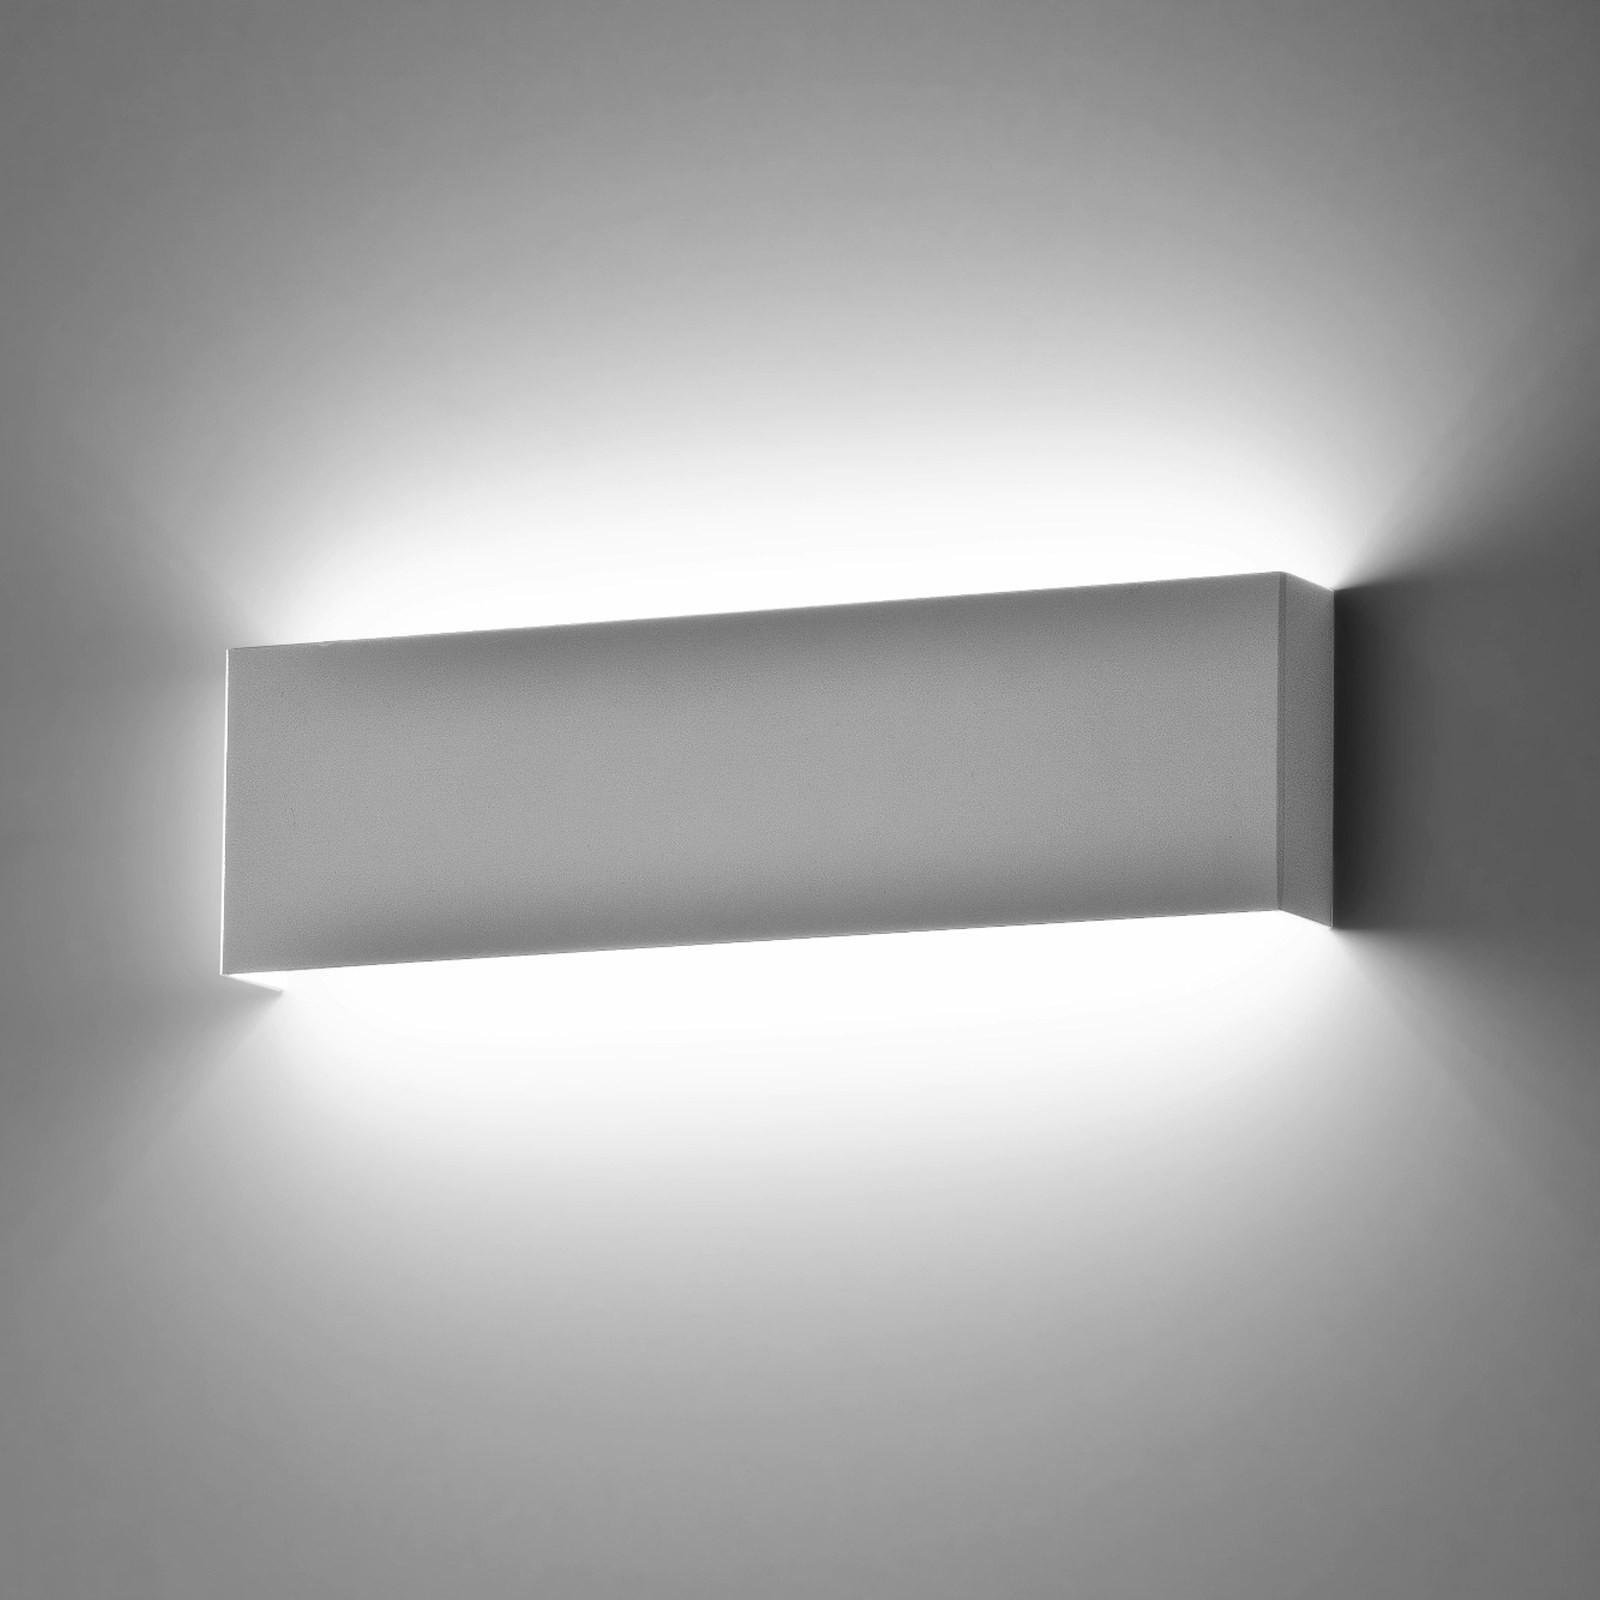 Plafoniera applique da parete muro lampada isyluce 901 - Meglio luce calda o fredda in cucina ...